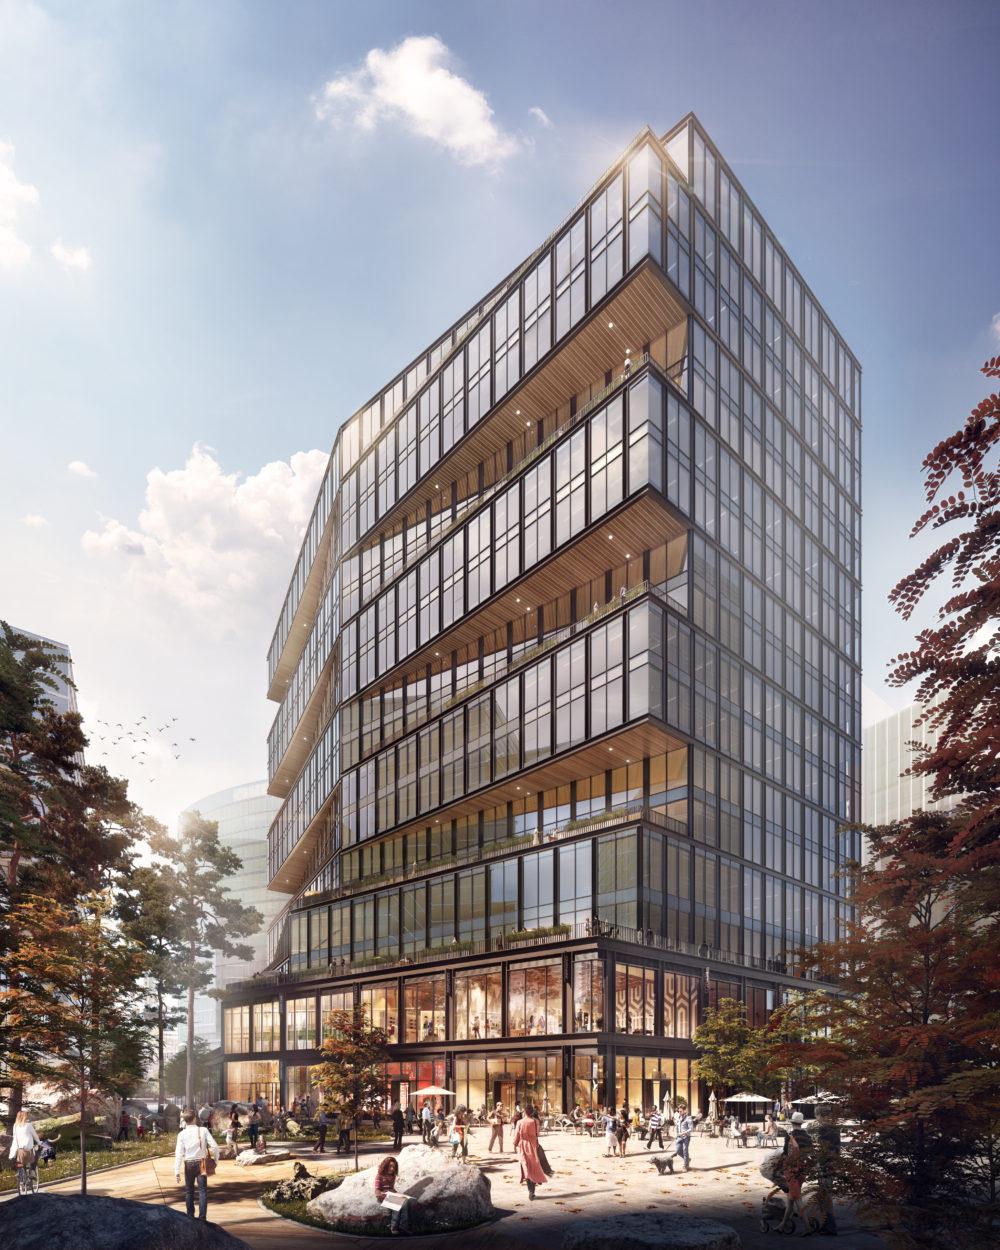 Rendering of Amazon's new office building in WS Development's Boston Seaportdevelopment